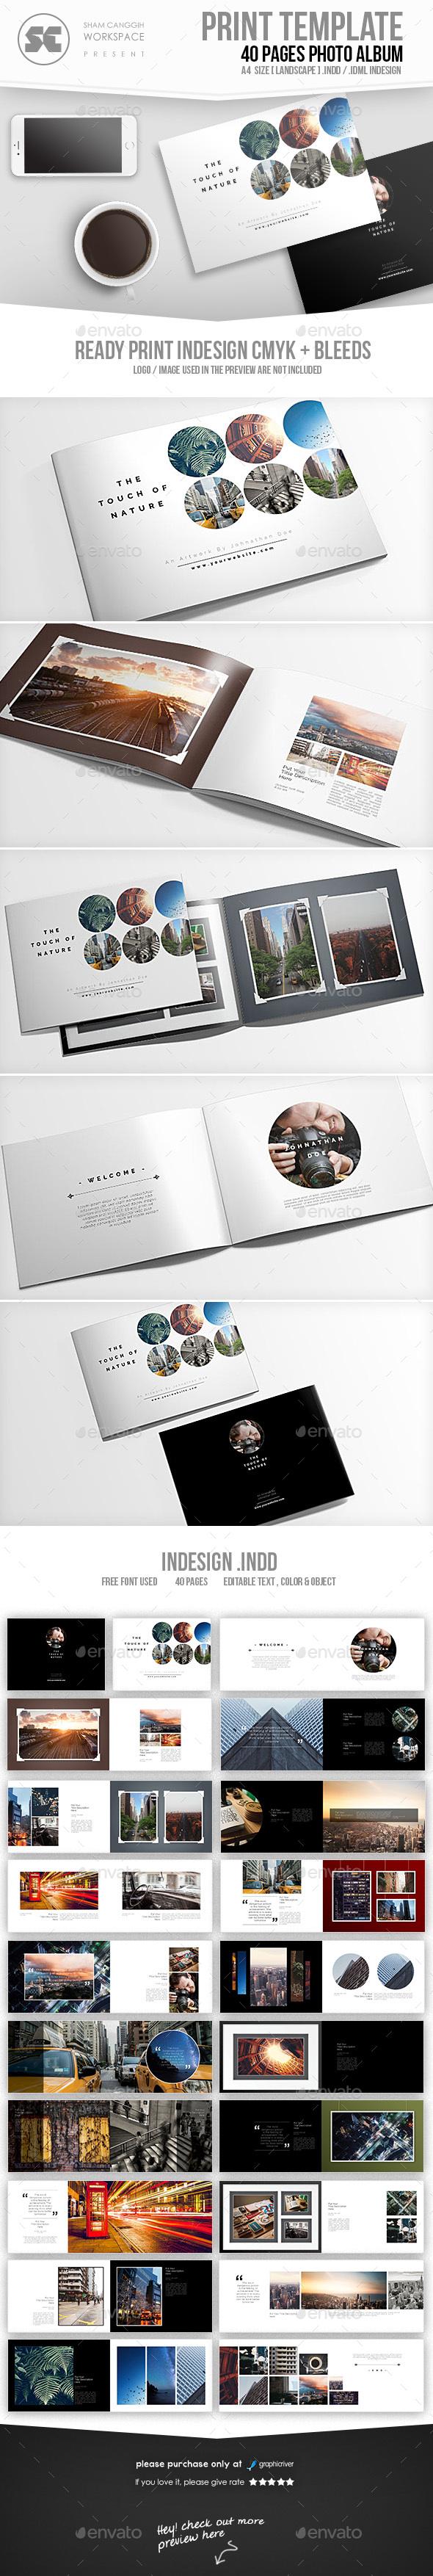 Wedding Album Graphics, Designs & Templates from GraphicRiver